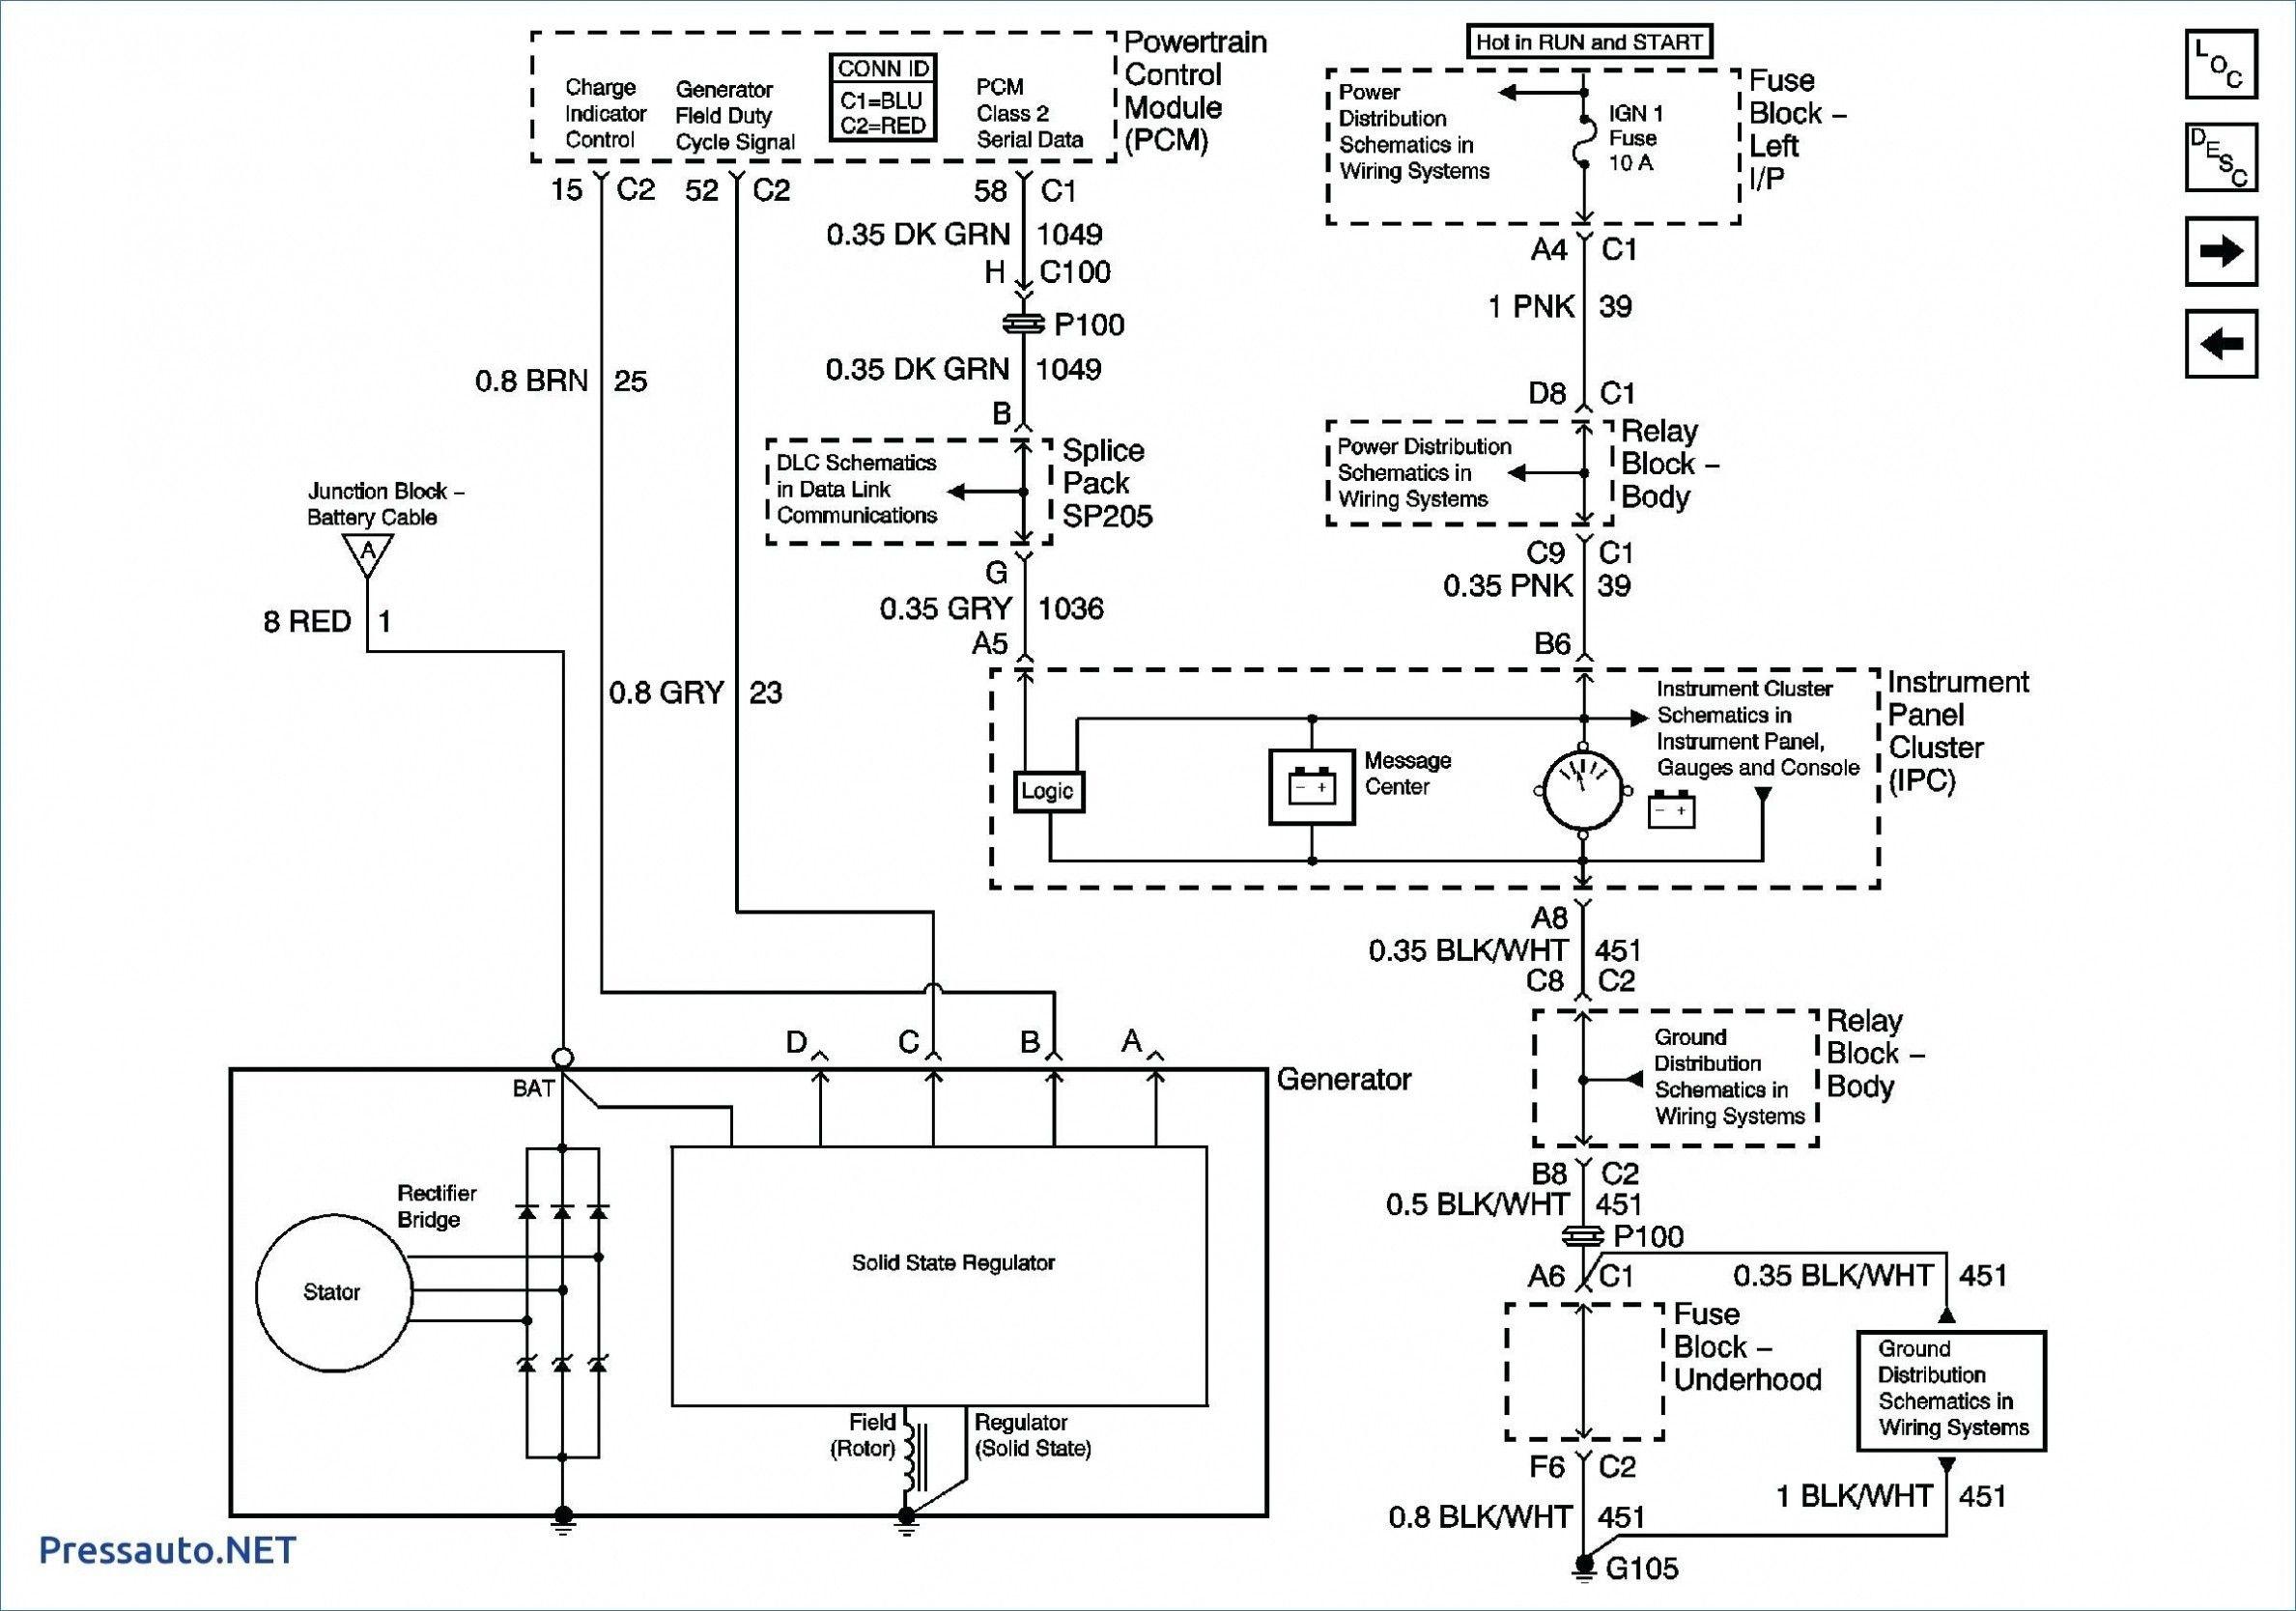 Fresh Proform Alternator Wiring Diagram Diagrams Digramssample